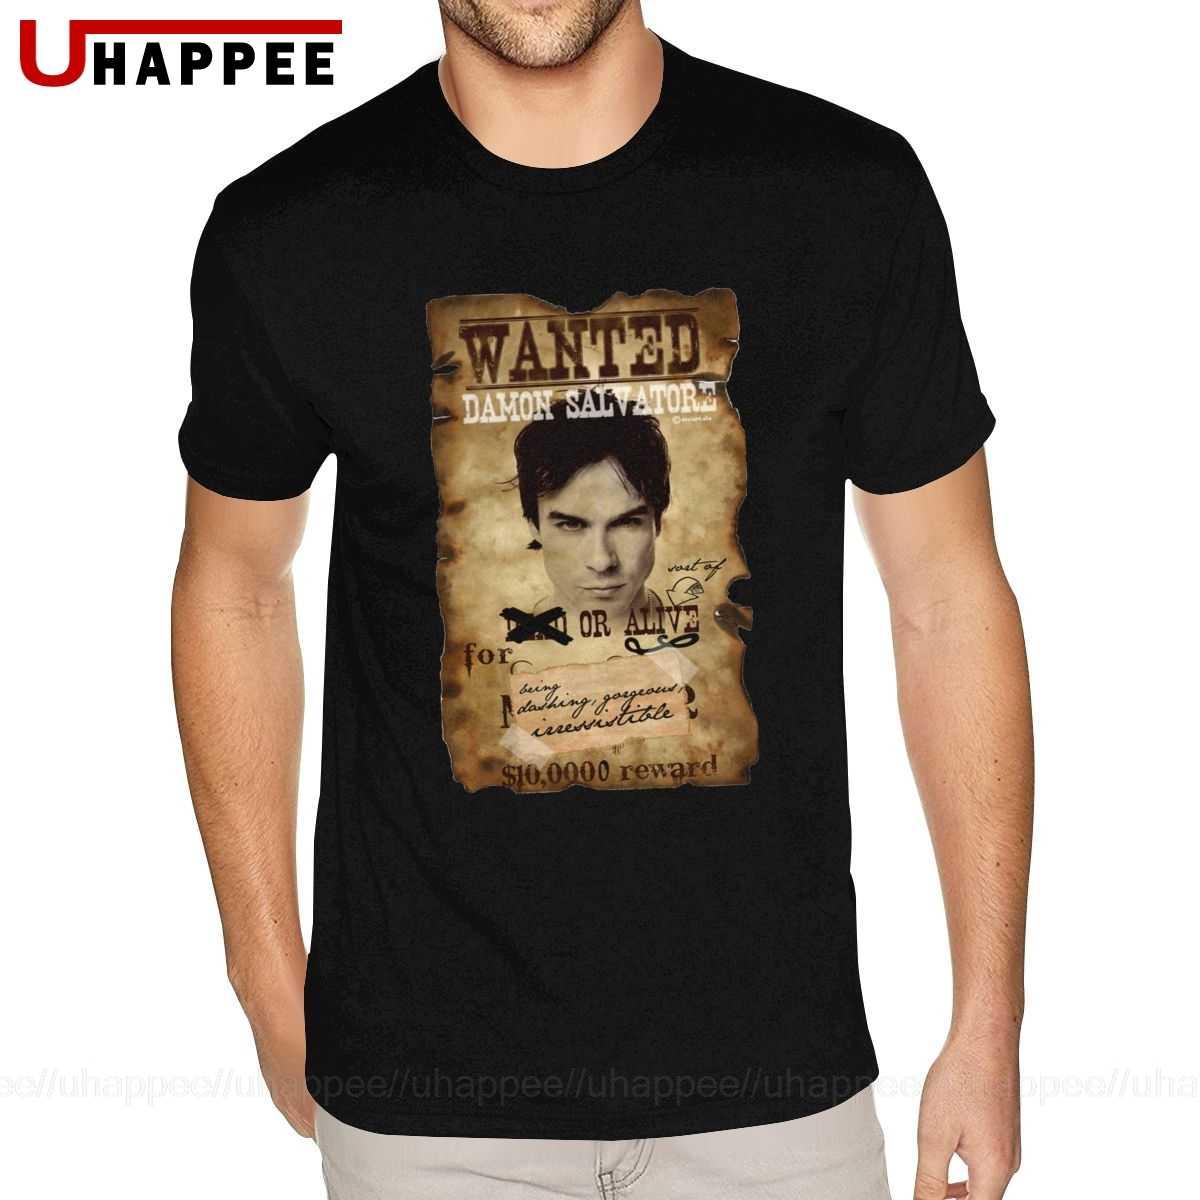 computer guardia Lavoro duro e faticoso  Printing Damon The Vampire Diaries T Shirt Men Custom Print Short Sleeves  Premium Cotton Crew Neck Tees|T-Shirts| - AliExpress